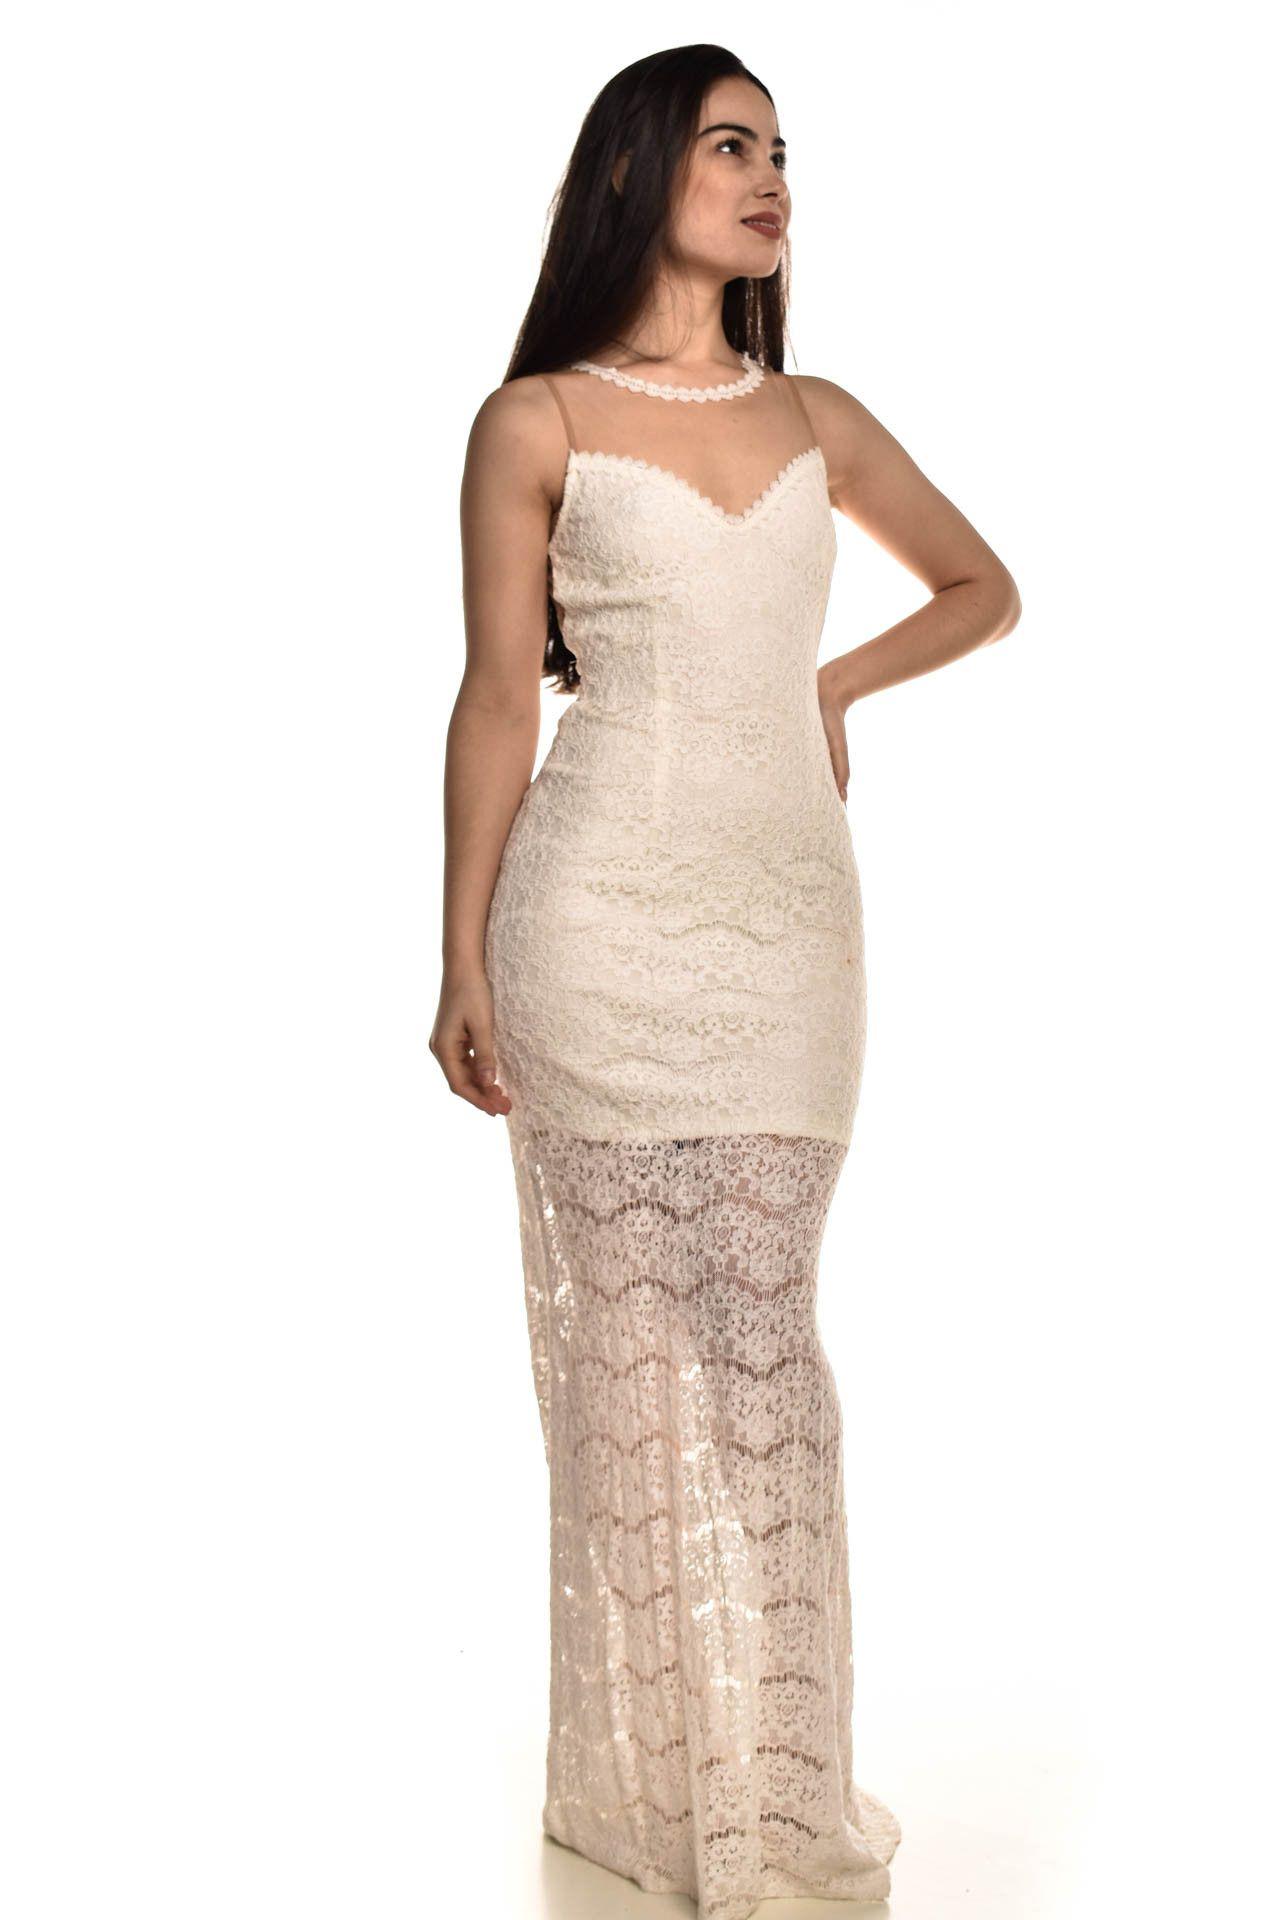 Cheroy - Vestido Longo Off White - Foto 3